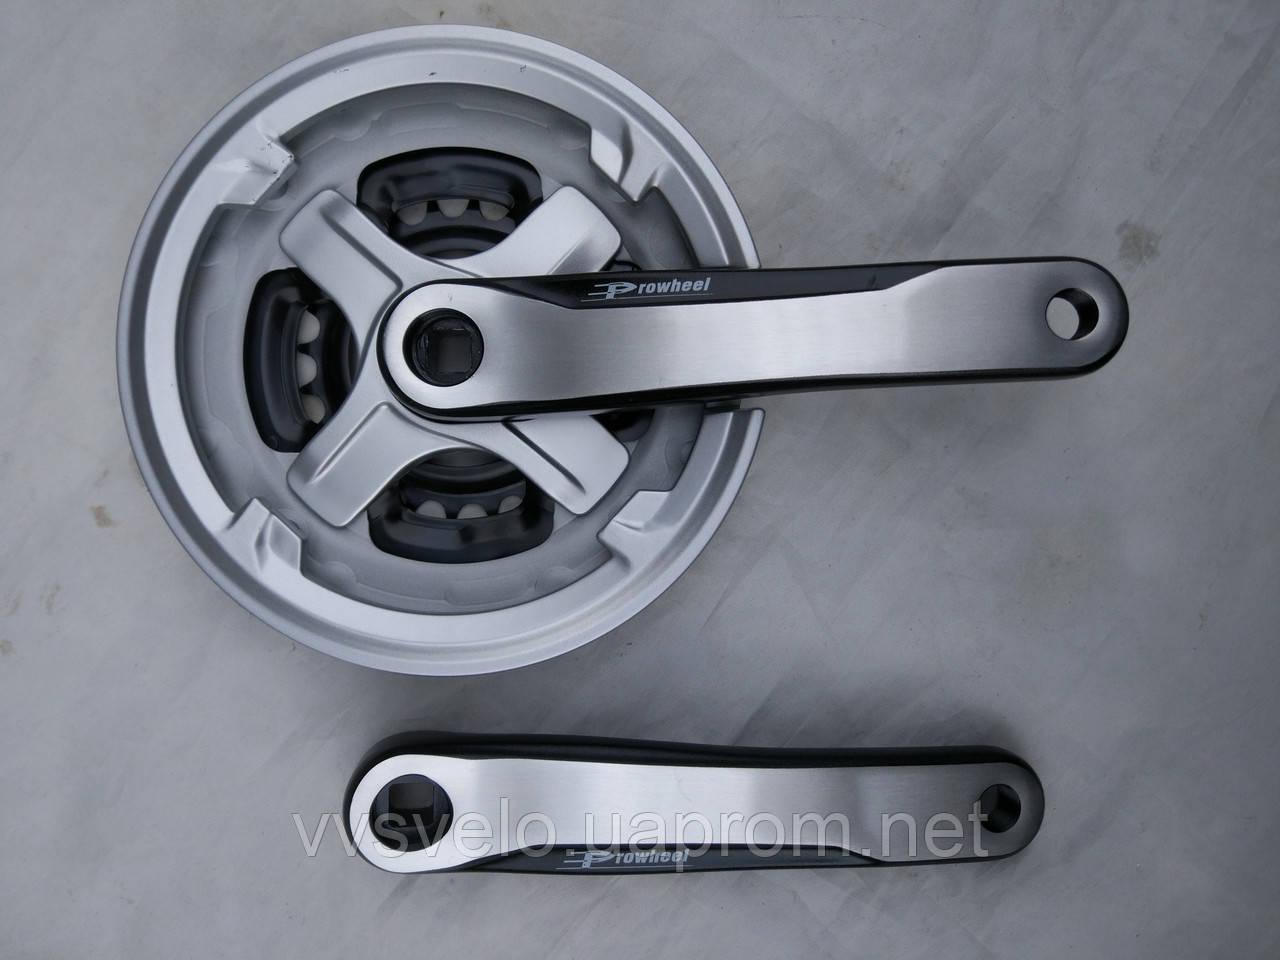 Комплект шатунов prowheel 42/34/24 170 mm серый 2017